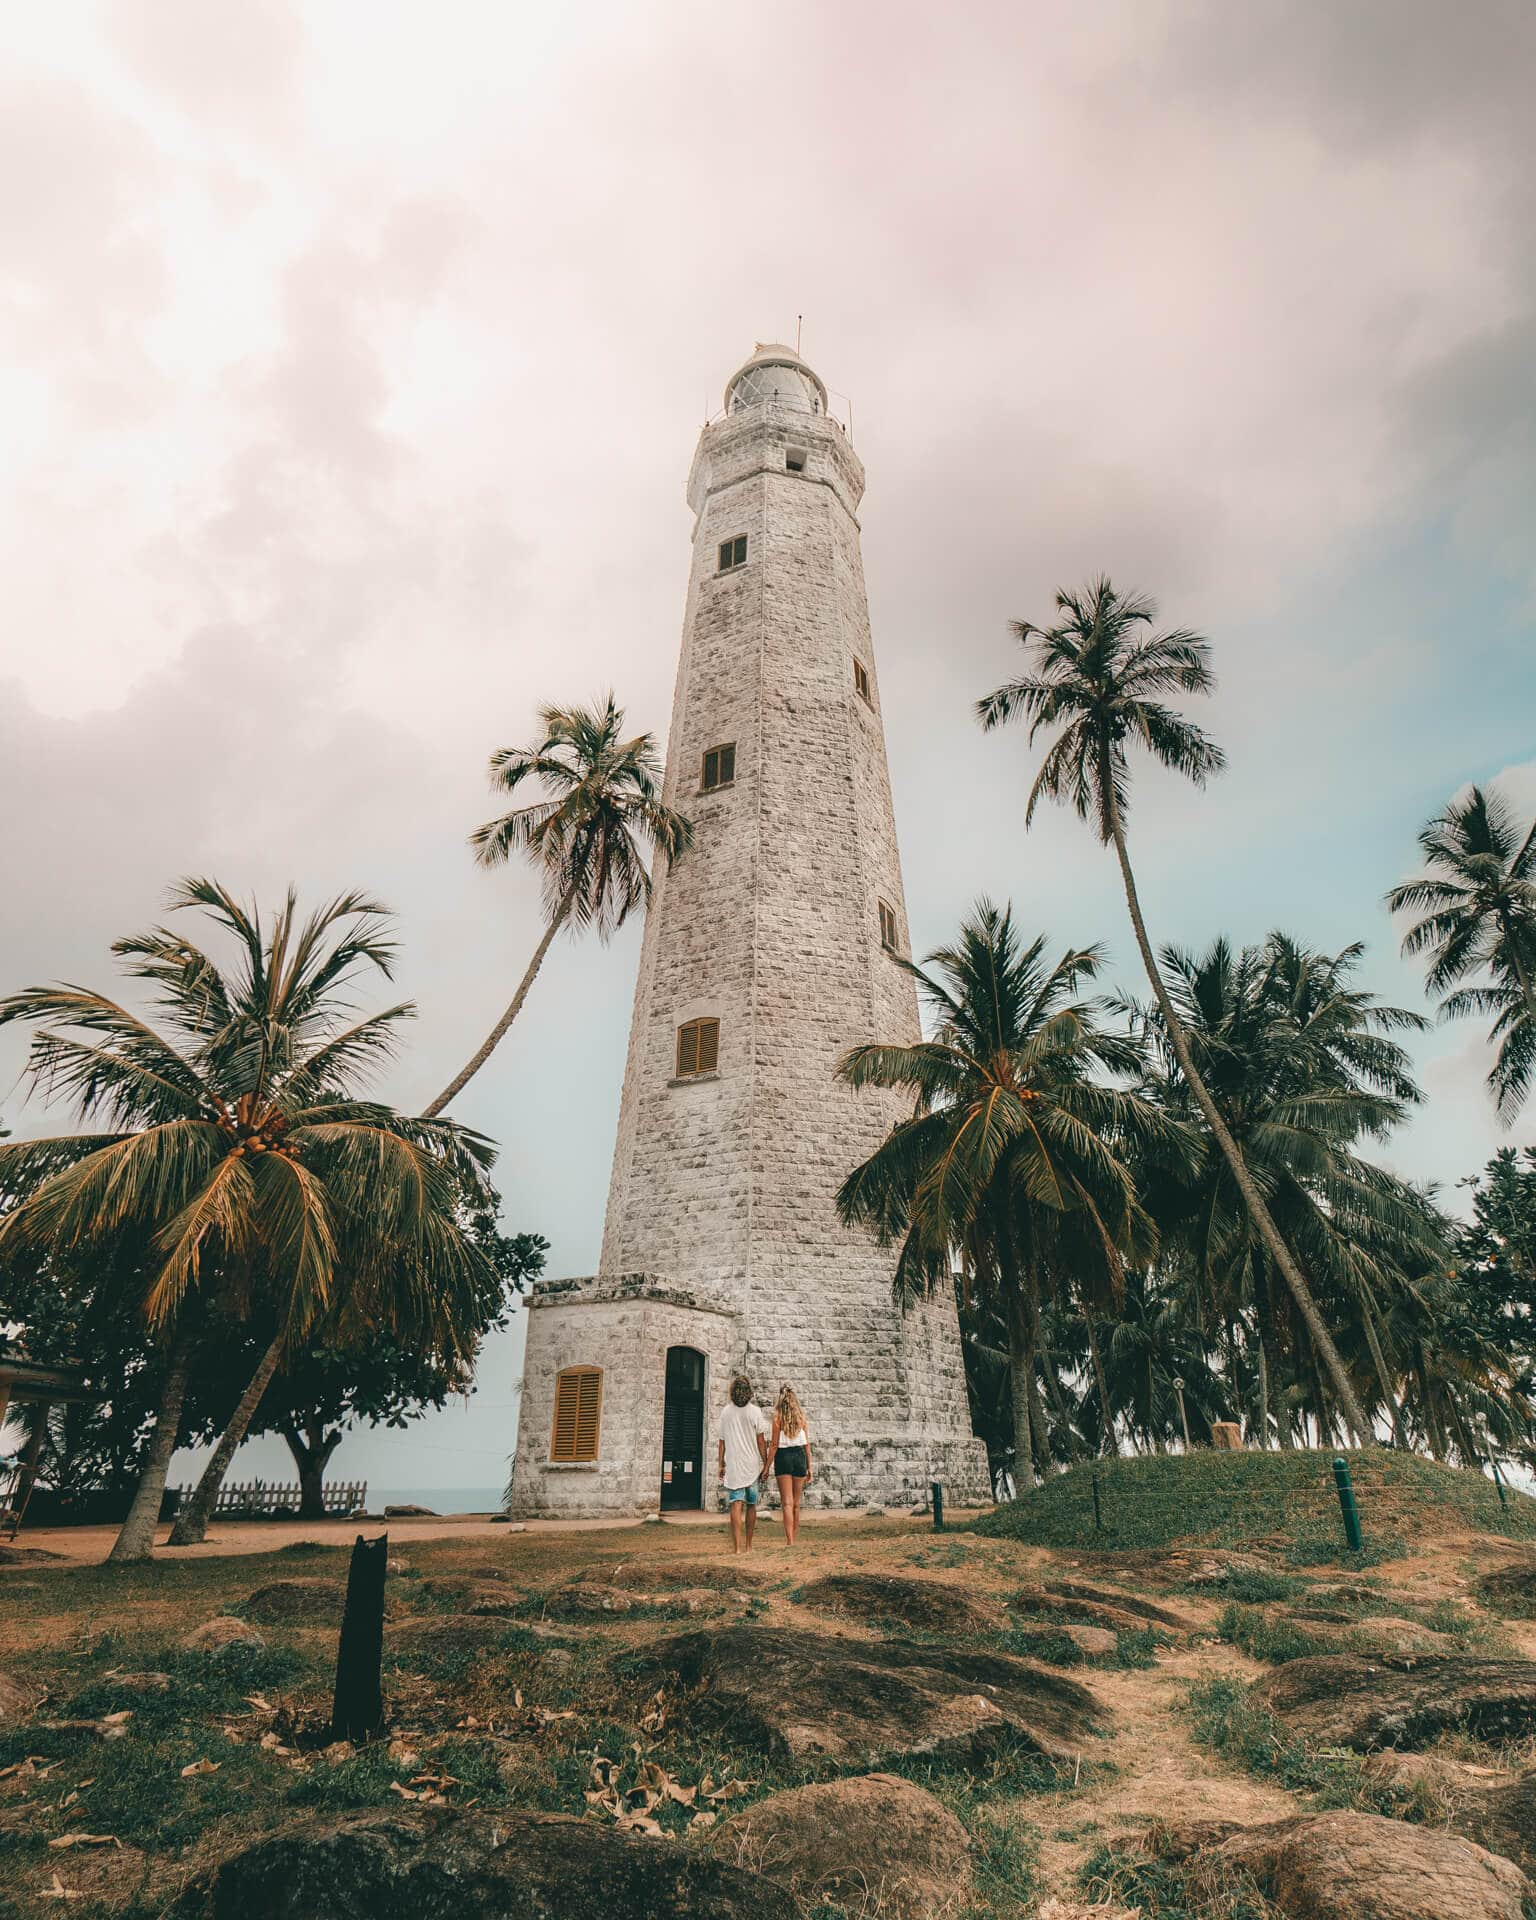 Hiriketiya Dikwella Dondra Lighthouse